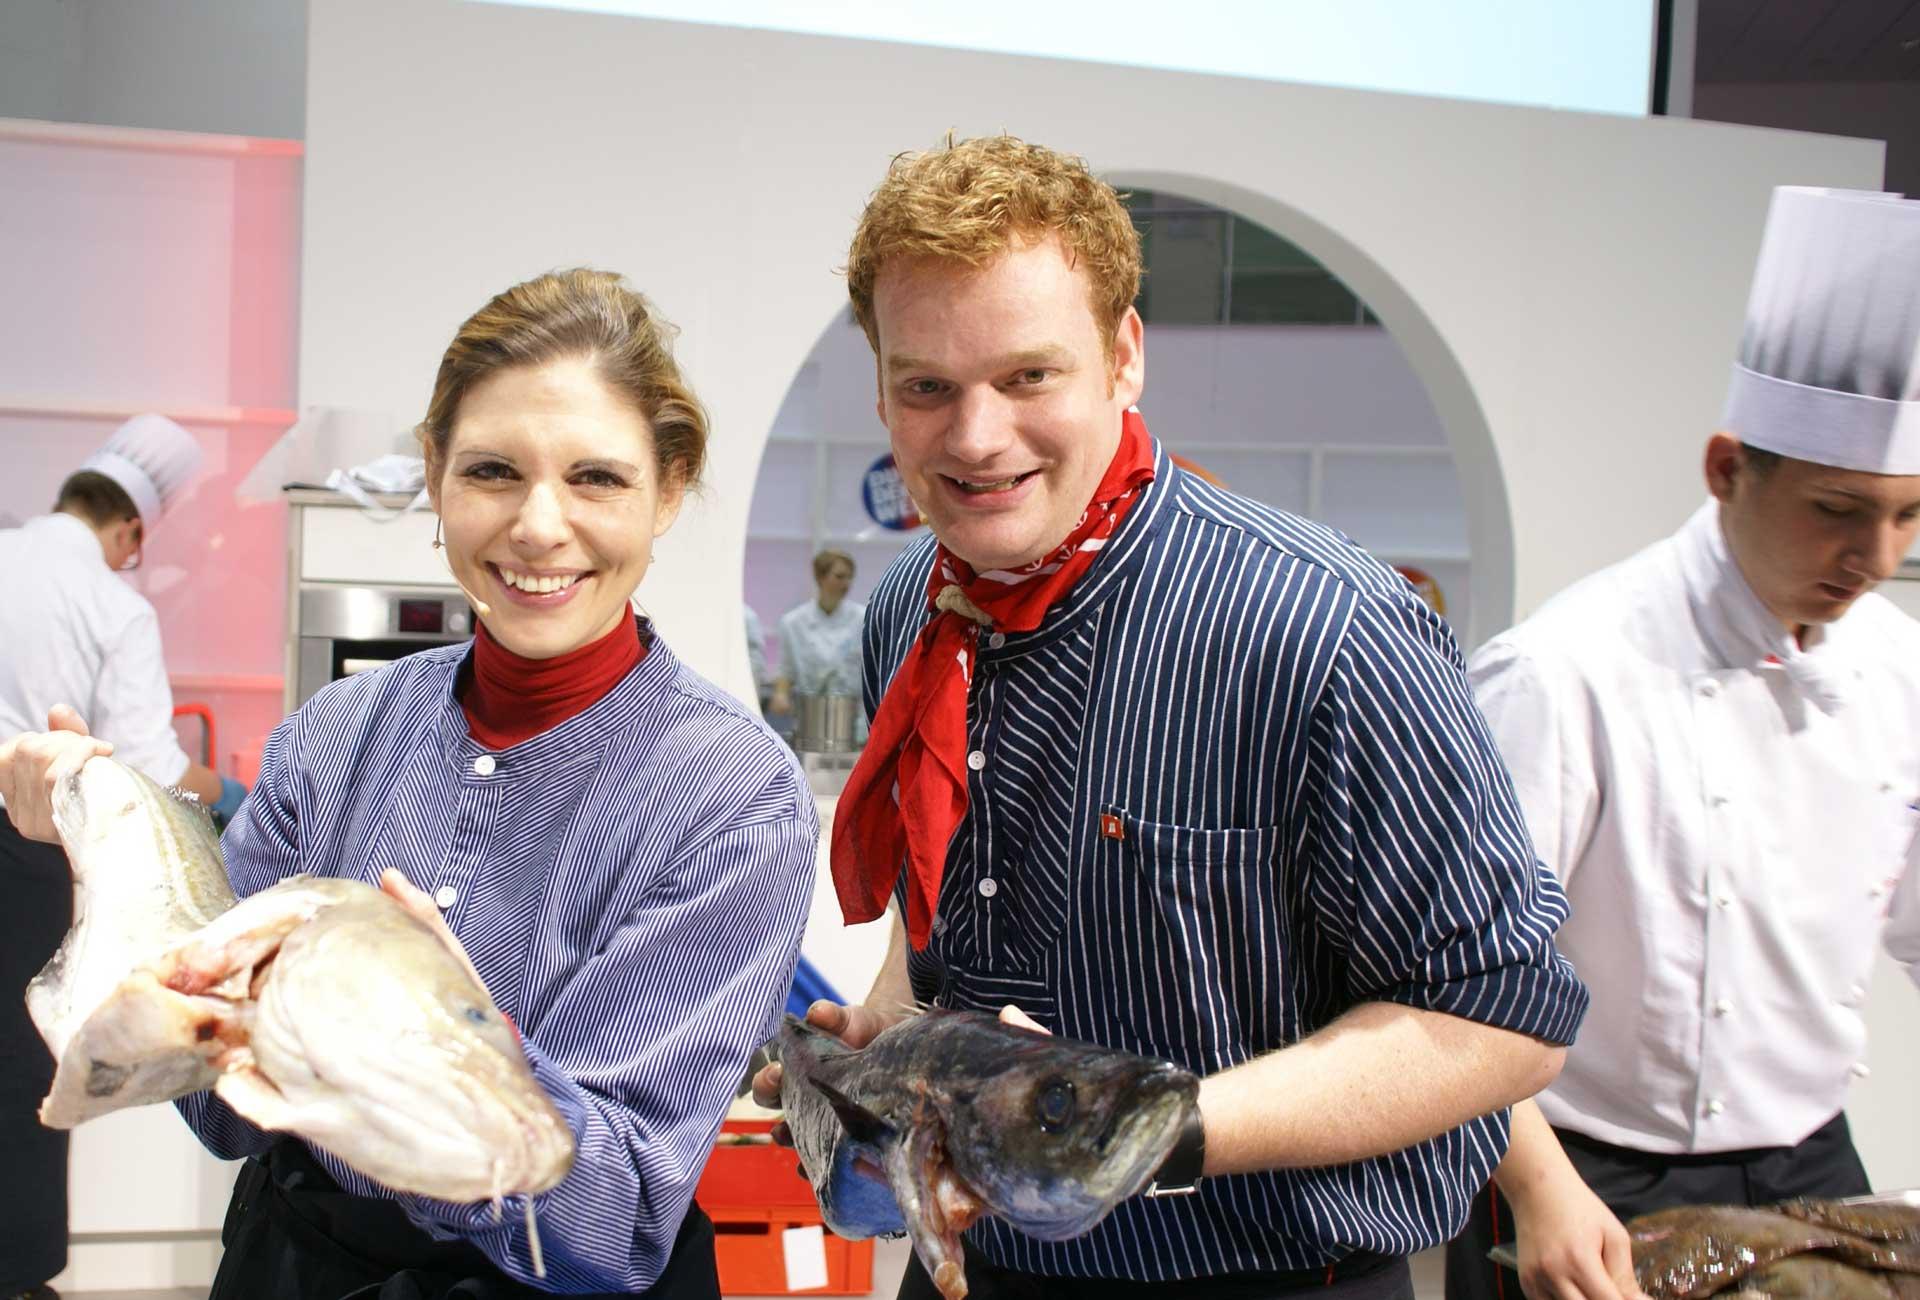 Moderatoren Duo Henning Harfst Steanie Dreyer moderieren Koch Show